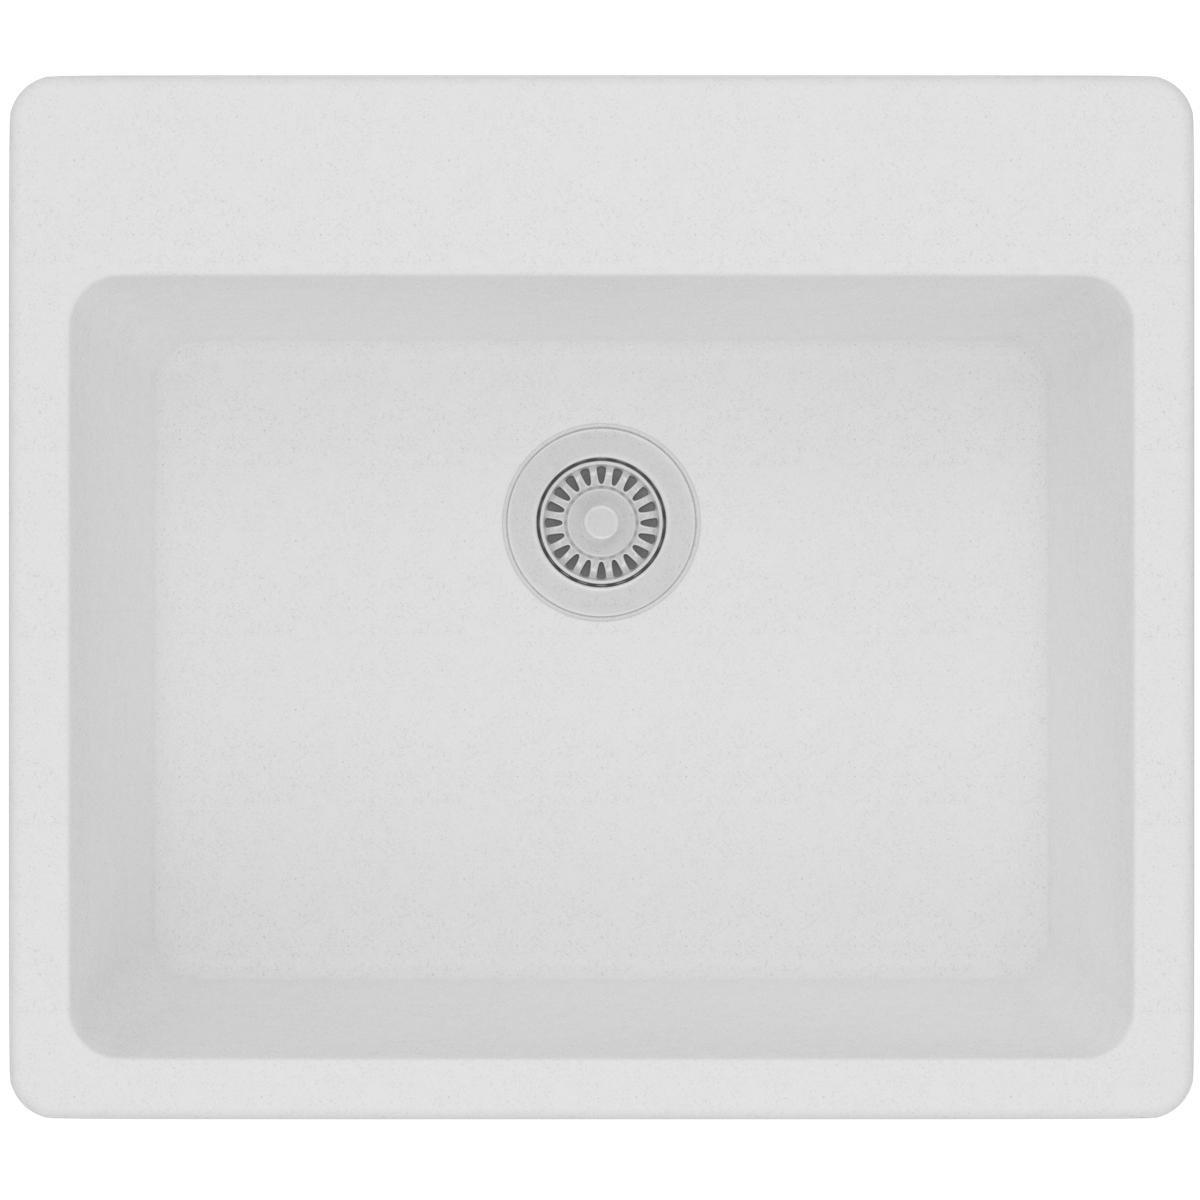 Elkay Quartz Classic ELG2522WH0 White Single Bowl Top Mount Sink